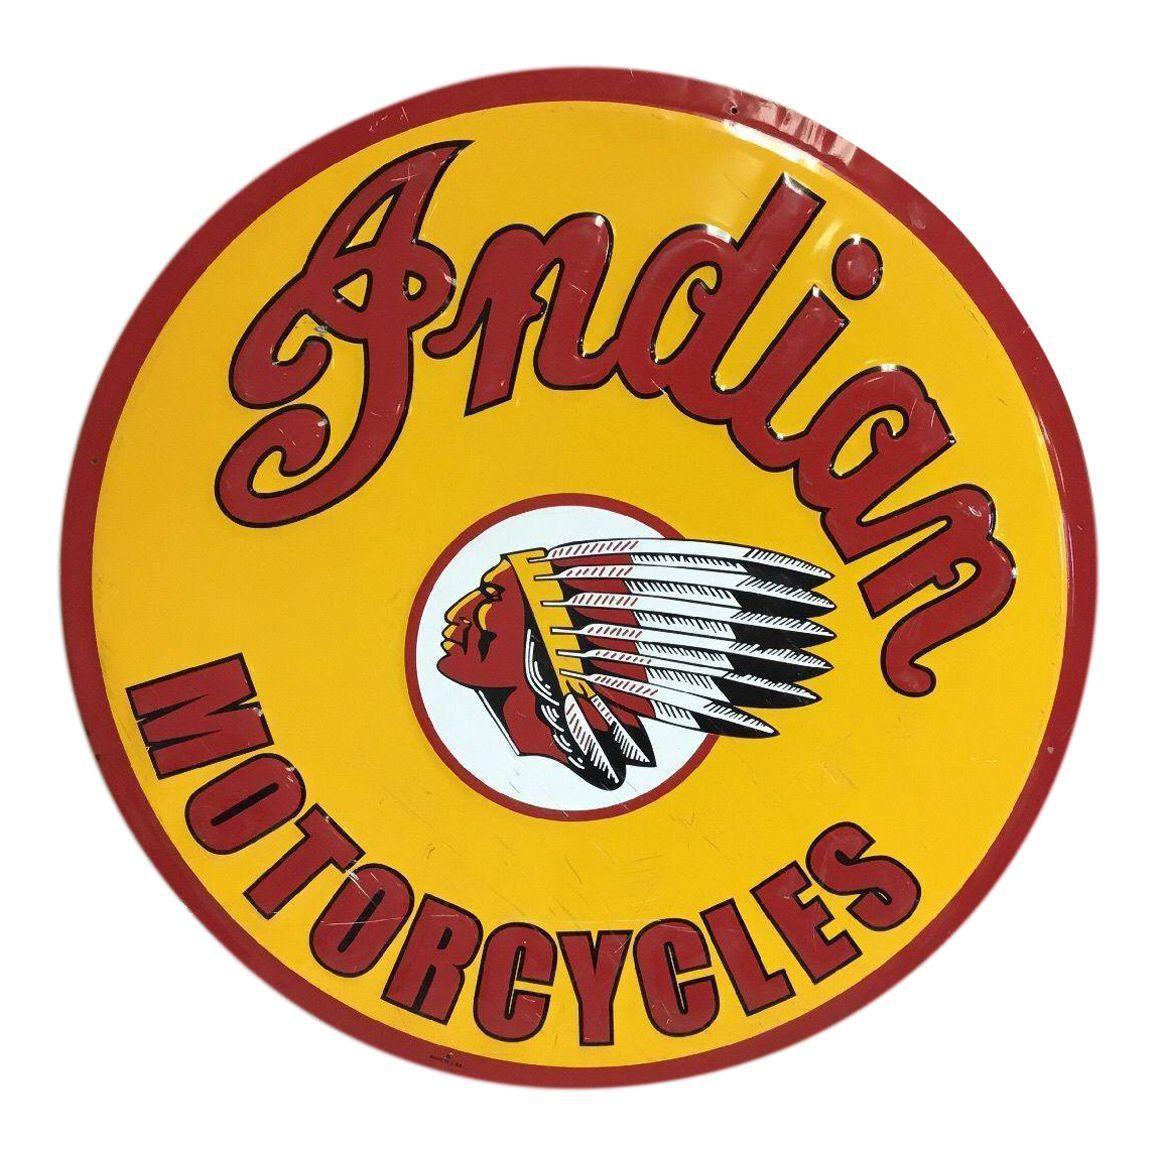 Vintage Indian Motorycle Metal Sign Image 1 of 5